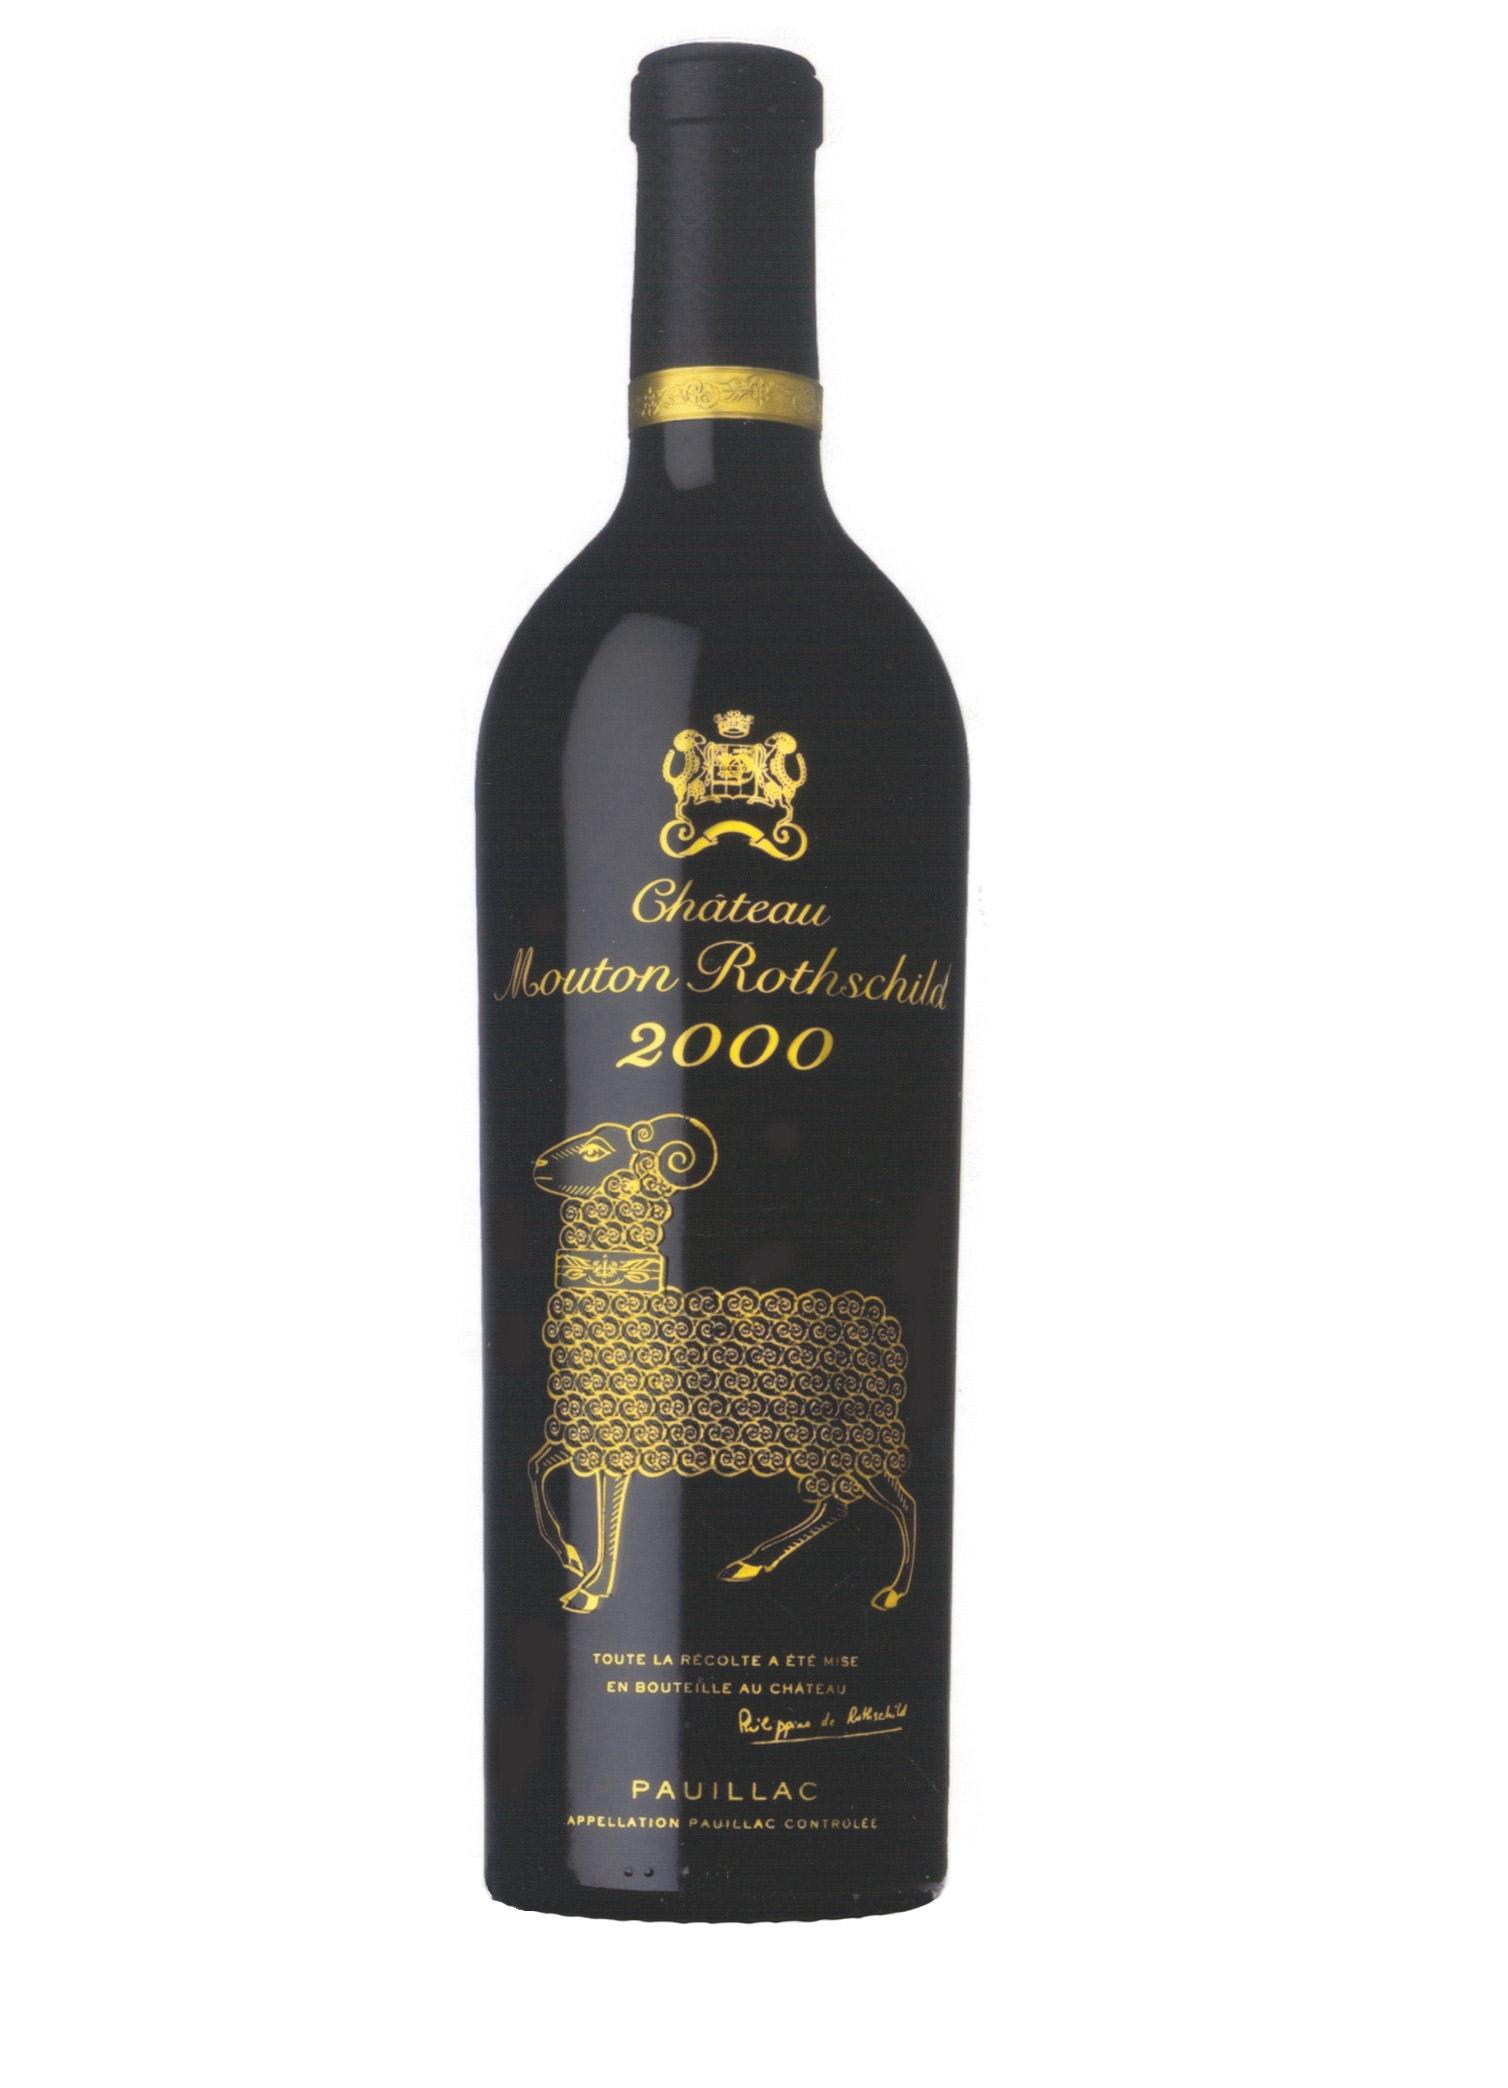 Mouton Rothschild bouteille 2000